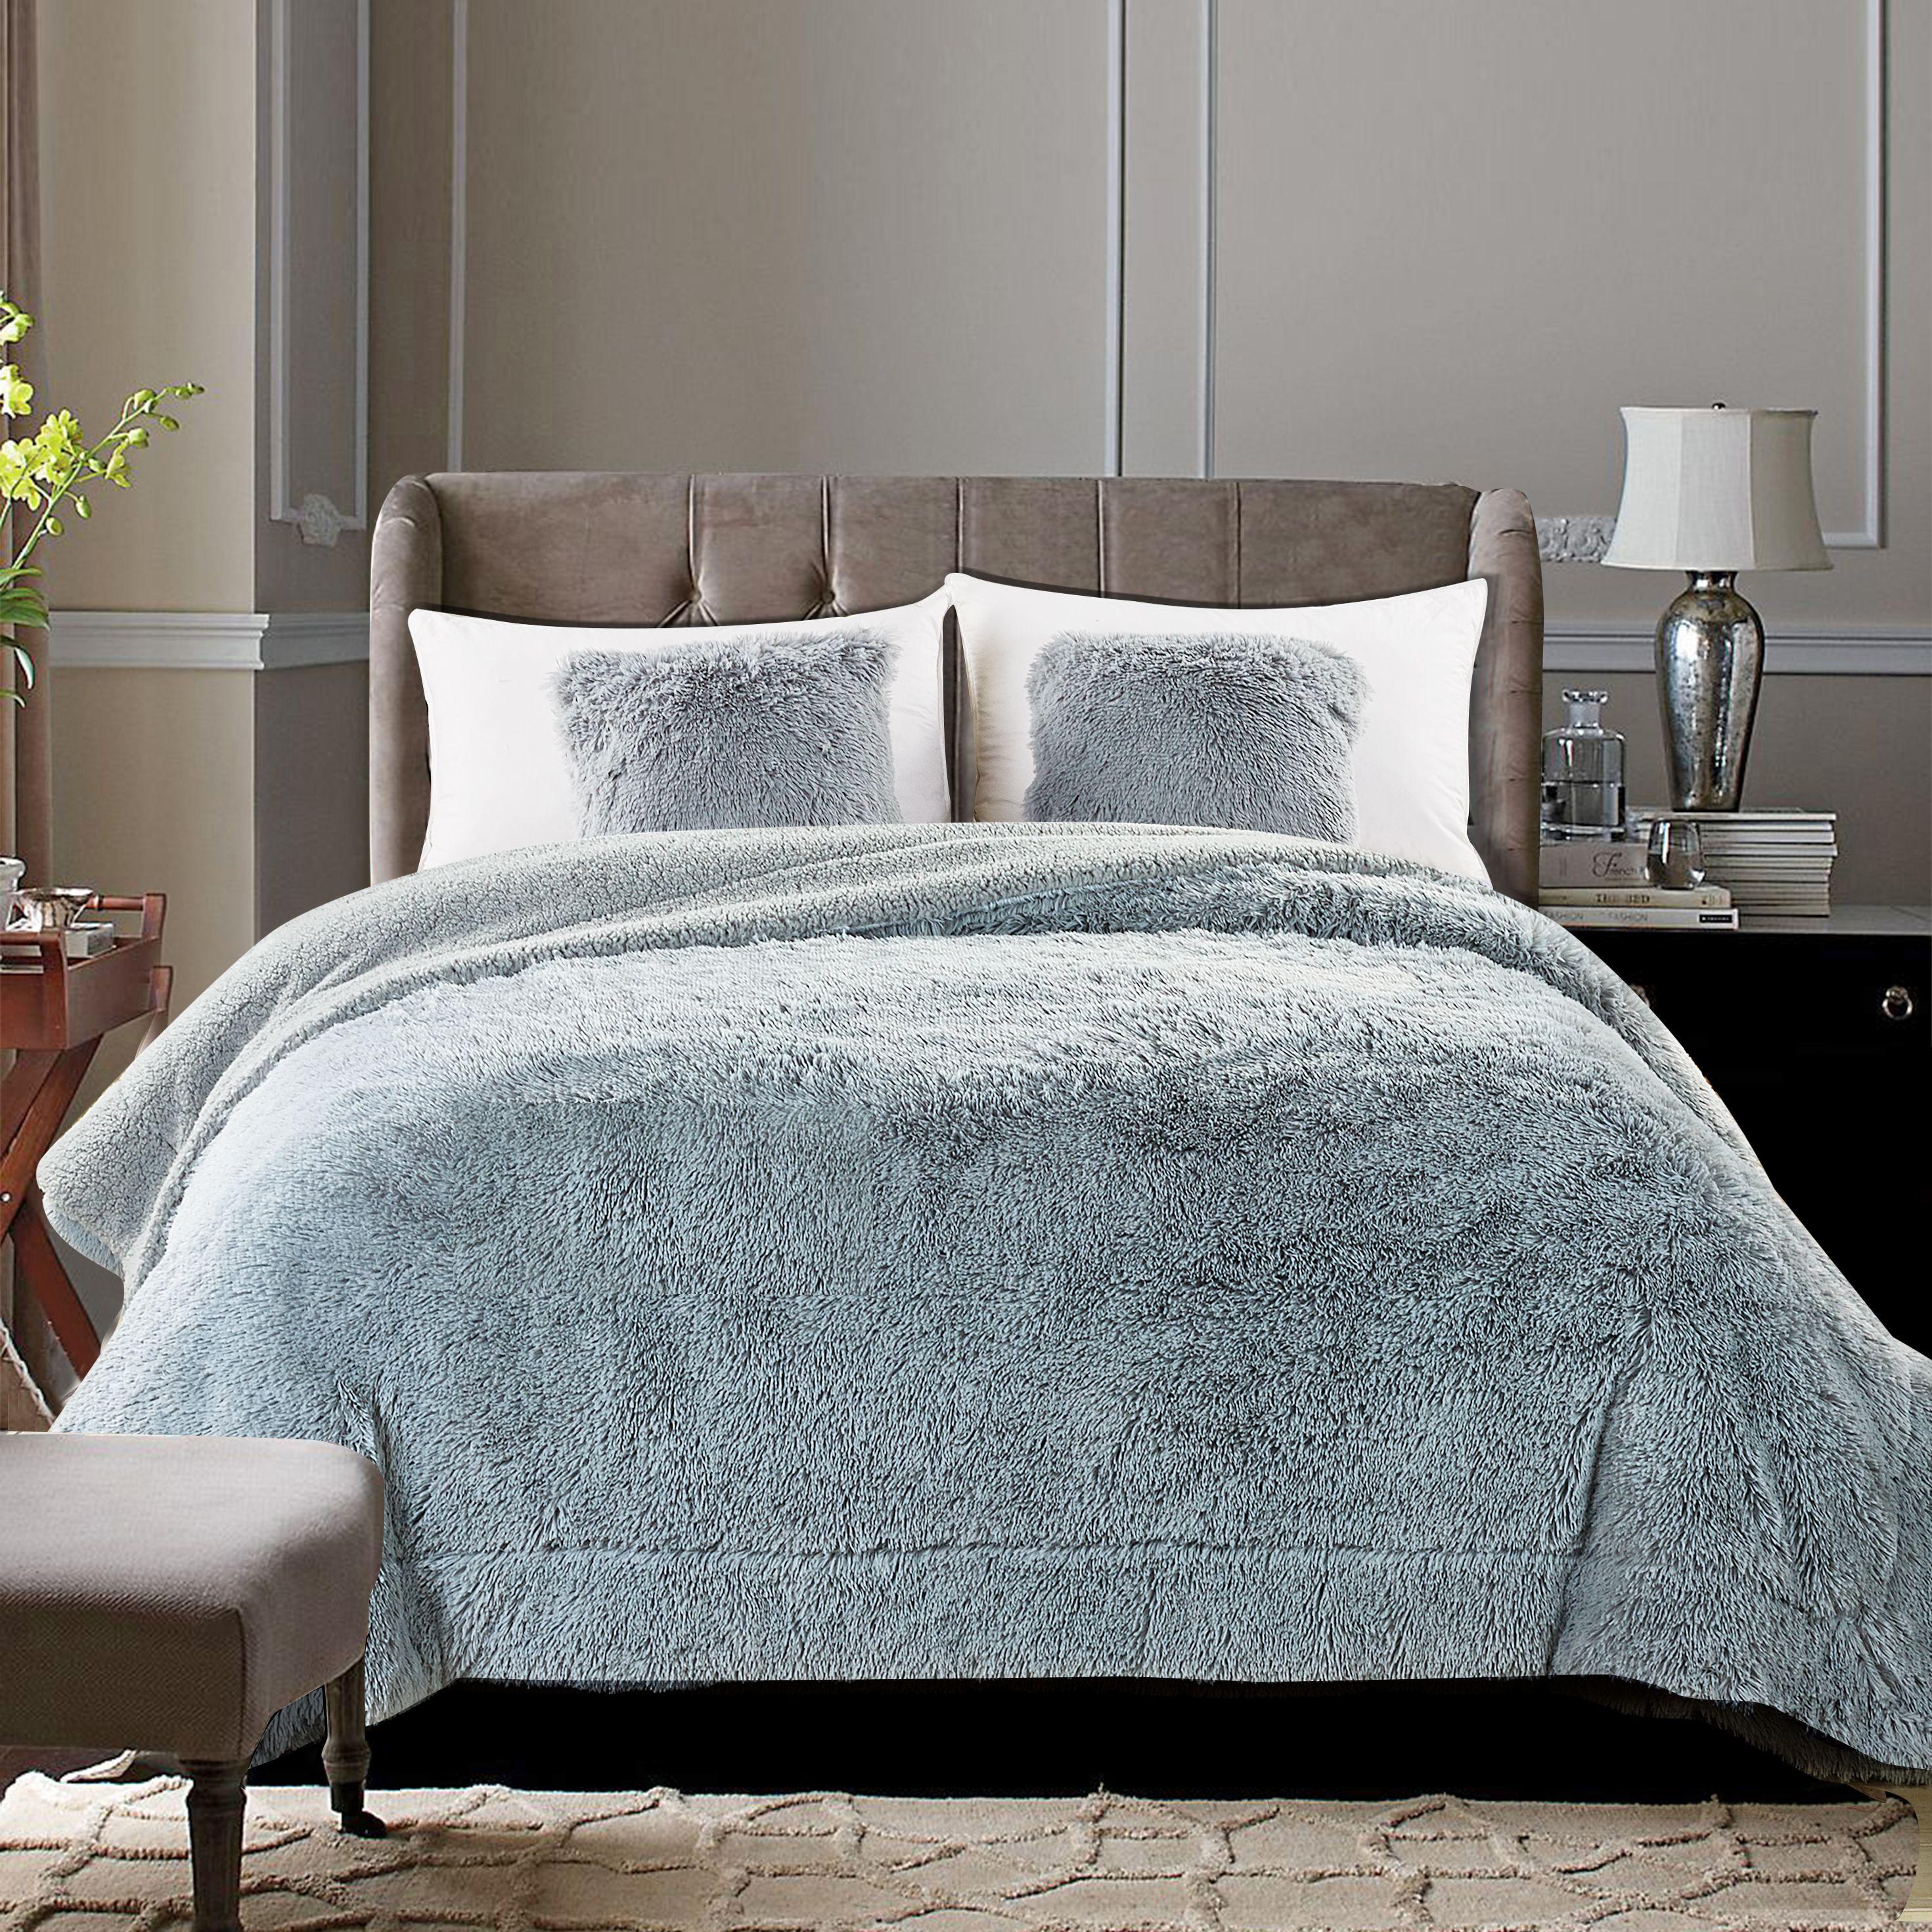 "Chanasya Super Soft Shaggy Longfur Throw Blanket   Snuggly Fuzzy Faux Fur Lightweight Warm Elegant Cozy Plush Sherpa Microfiber Blanket   For Couch Bed Chair Photo Props -50 ""x 65""- Purple Aubergine"